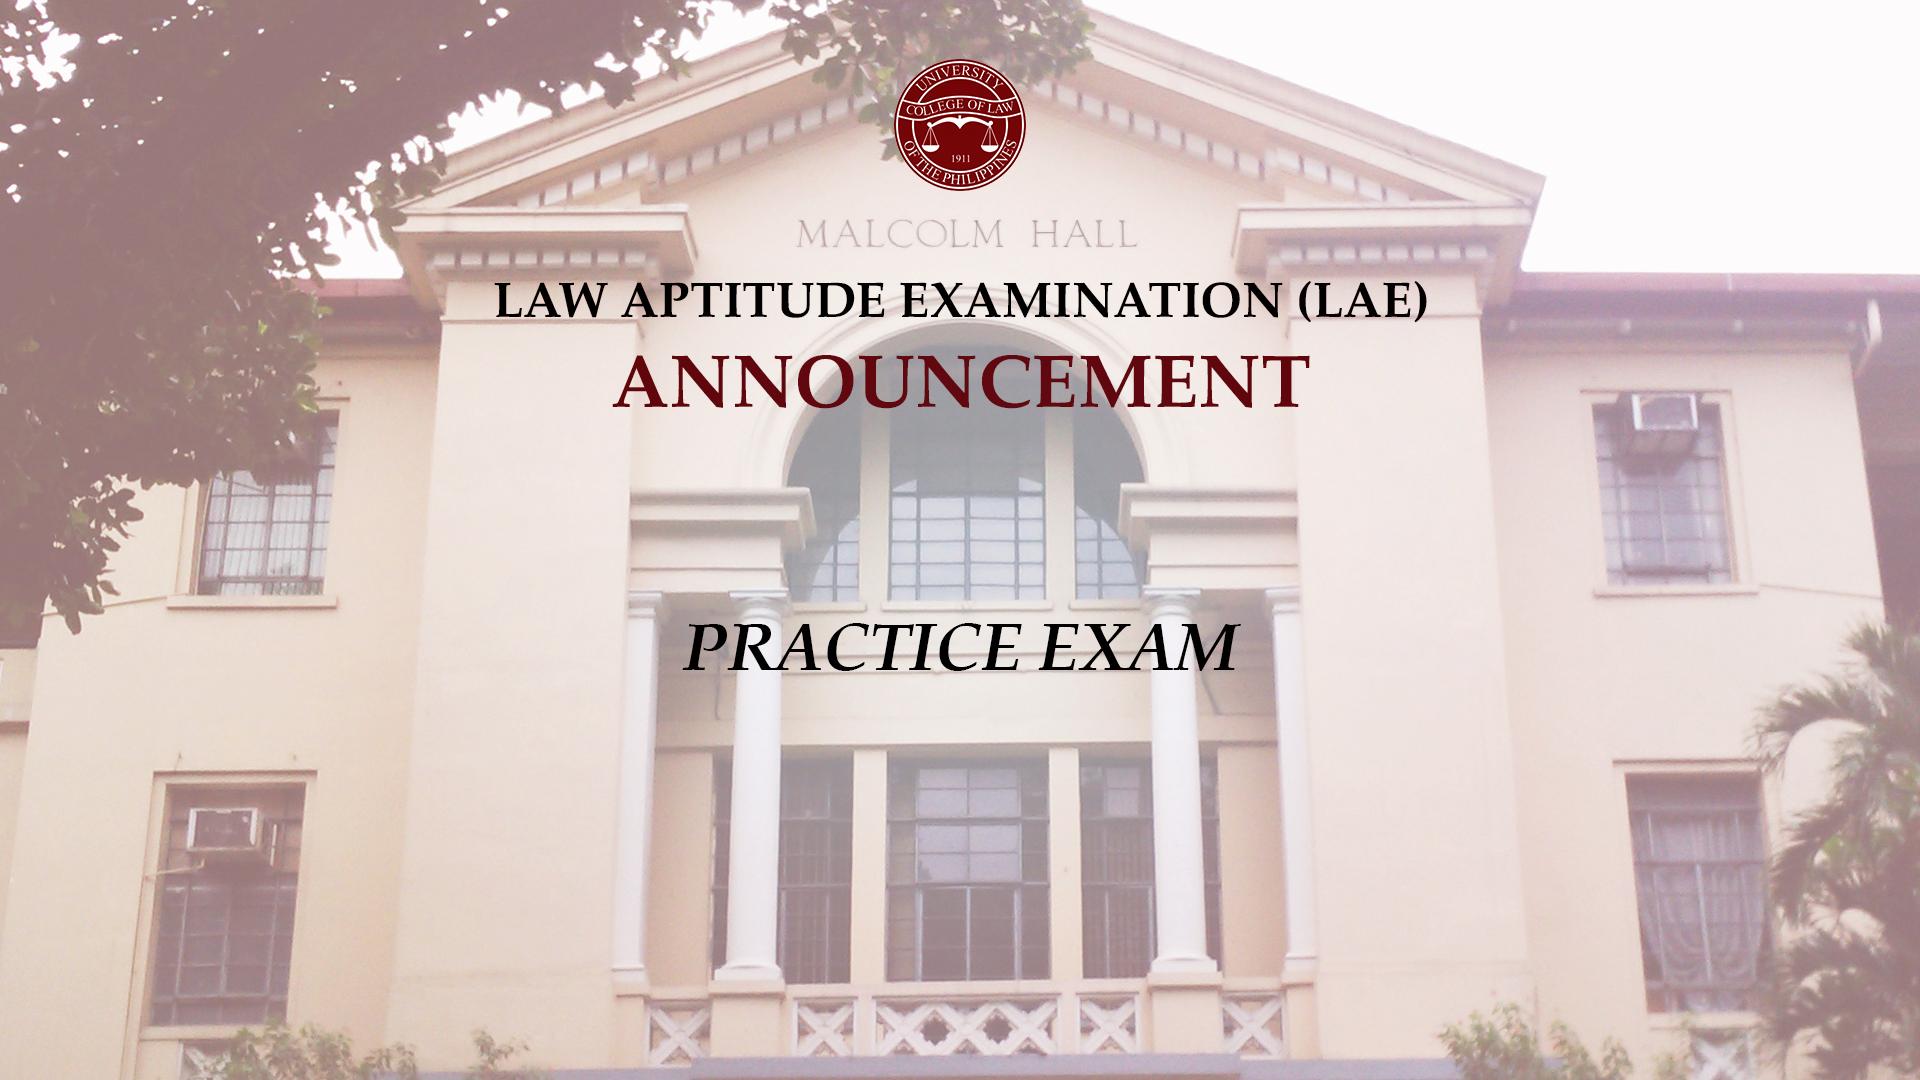 Law Aptitude Examination Practice Exam